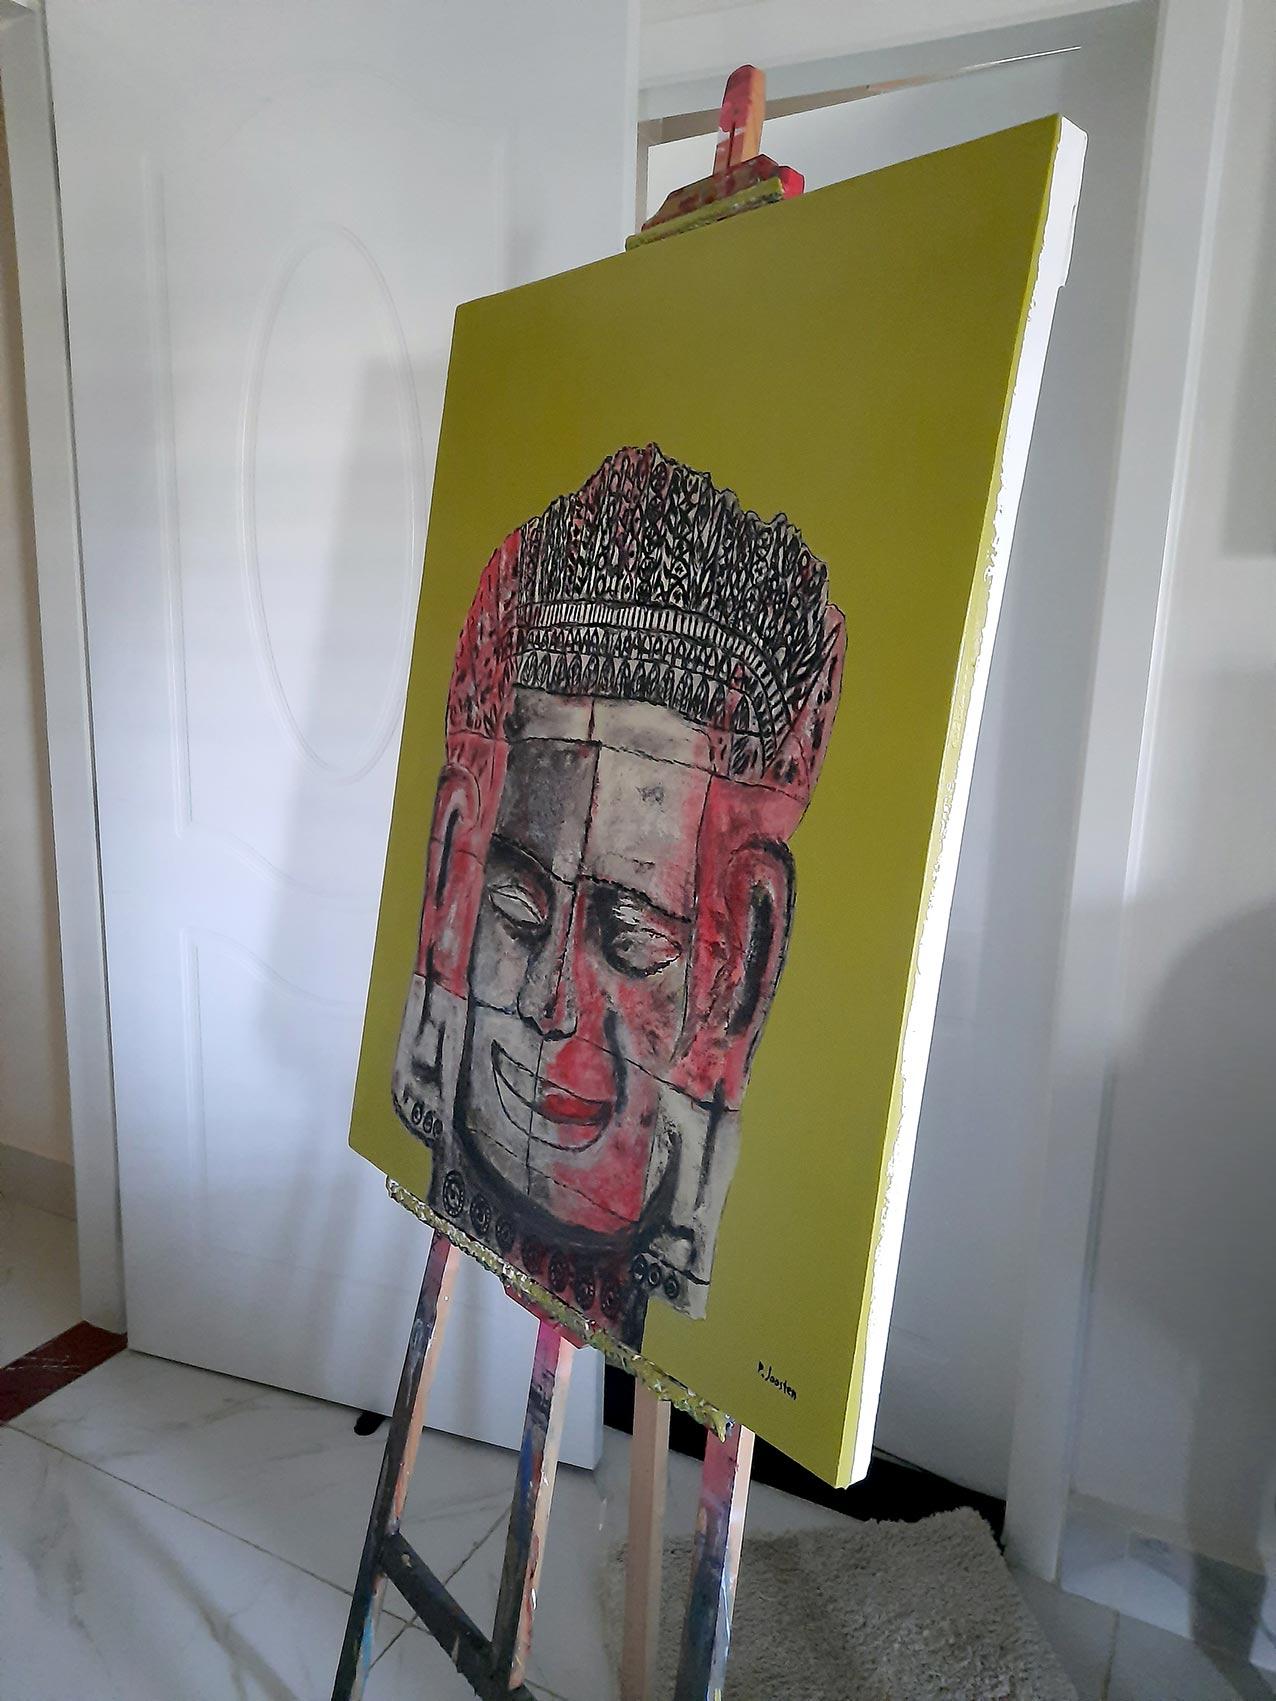 Buddha-head-Patrick-Joosten-2021-March-05th-Side-view